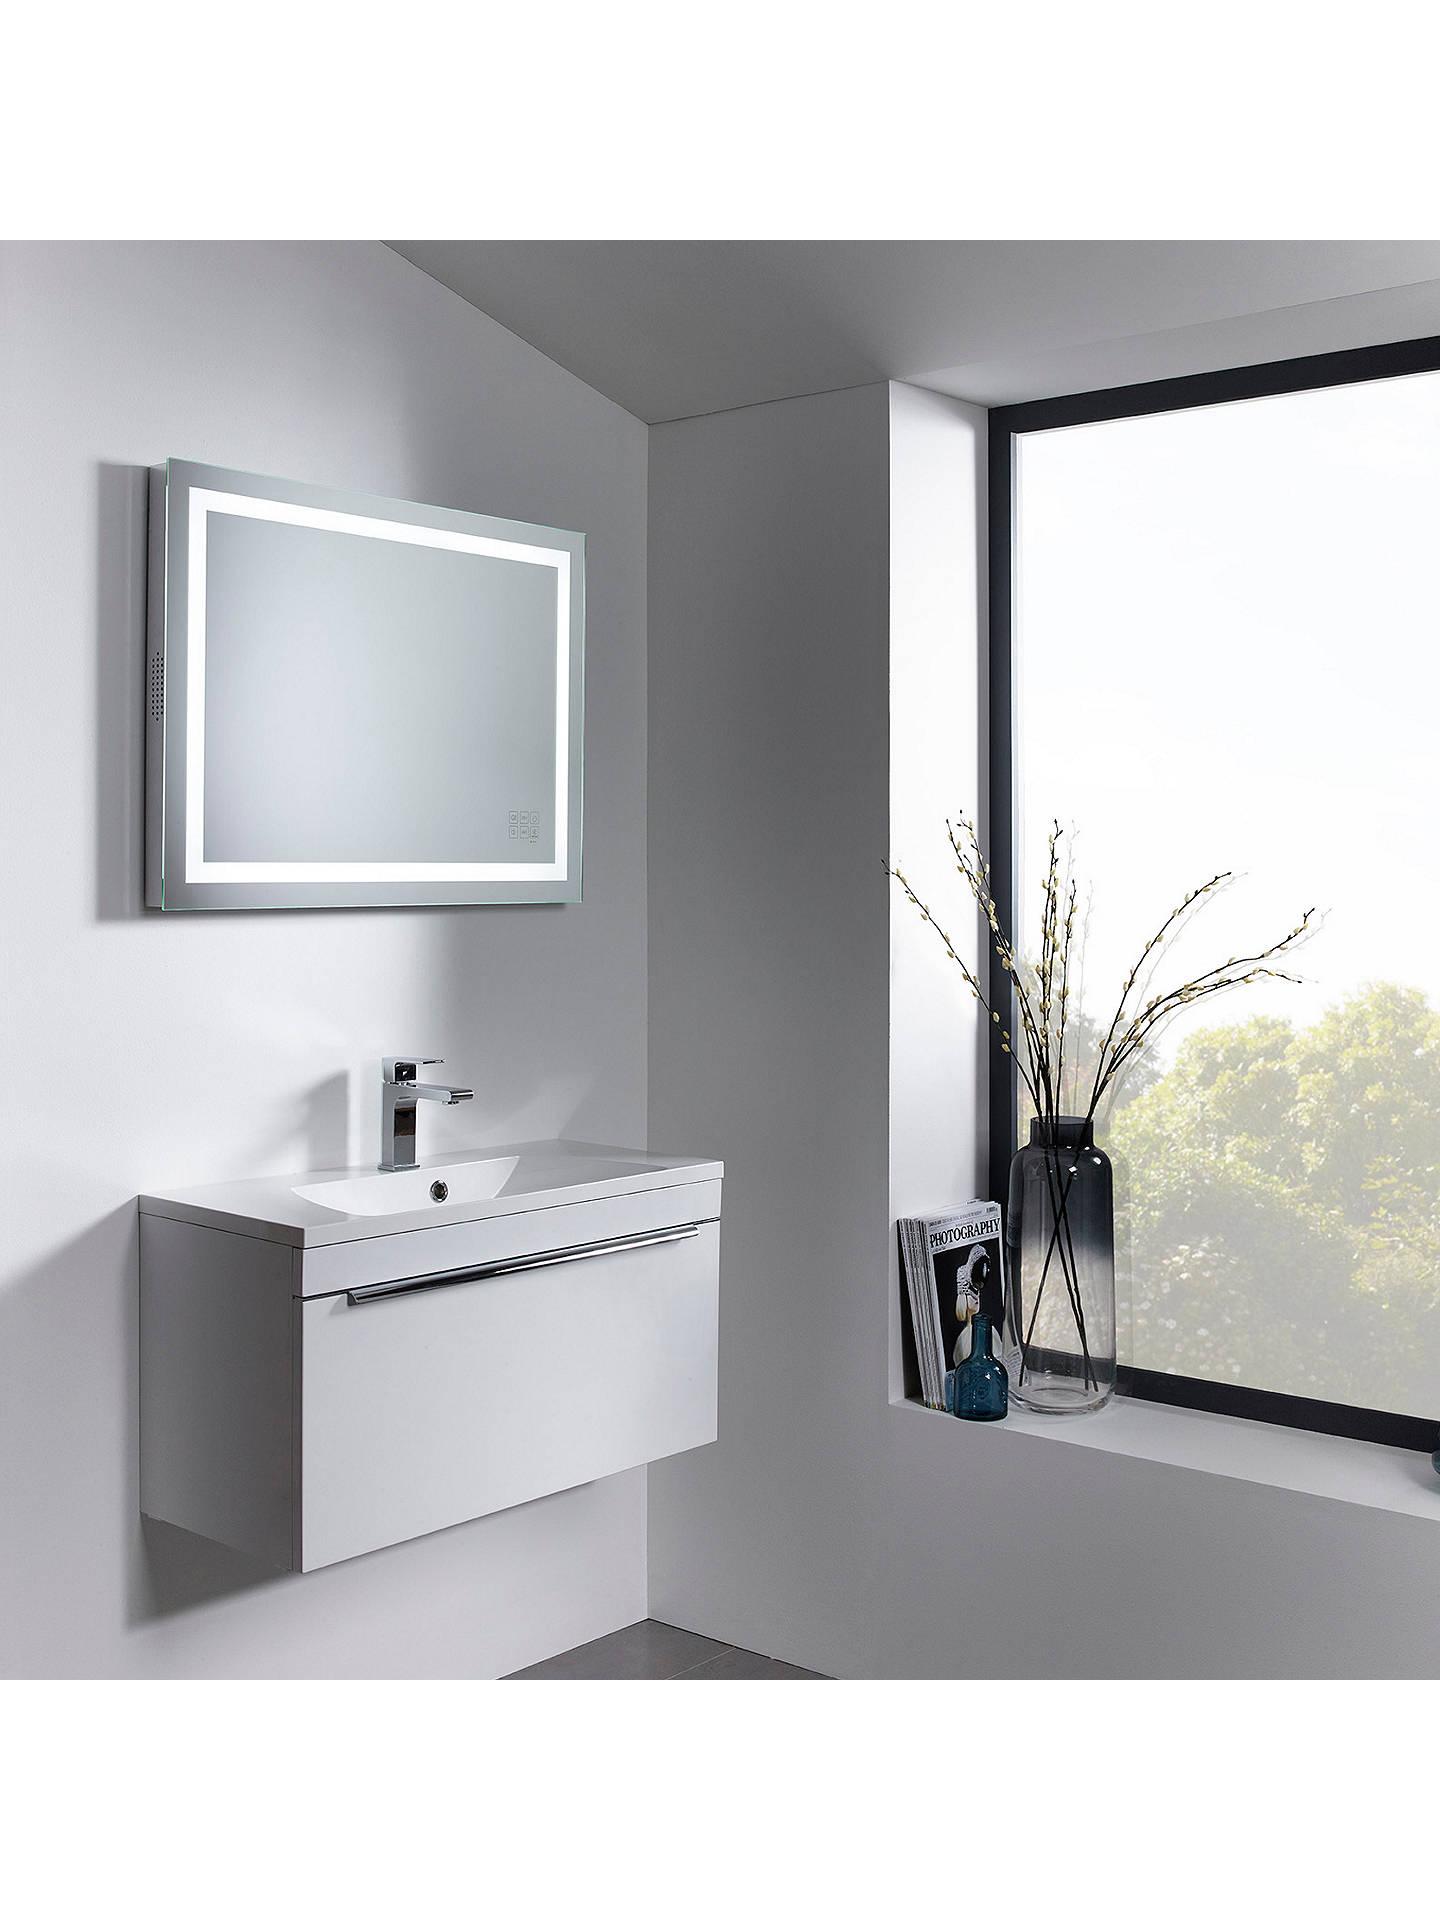 Roper Rhodes Beat Illuminated Led Bathroom Mirror with Integrated ...